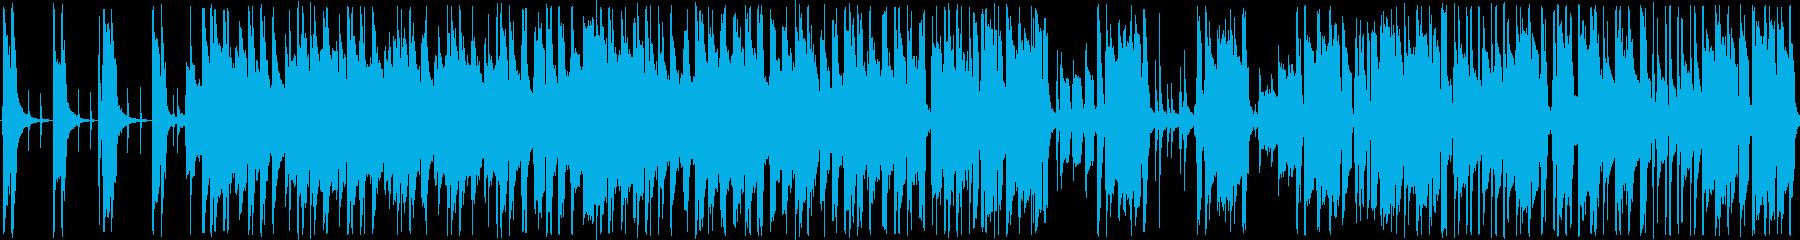 BGM_試合前の再生済みの波形